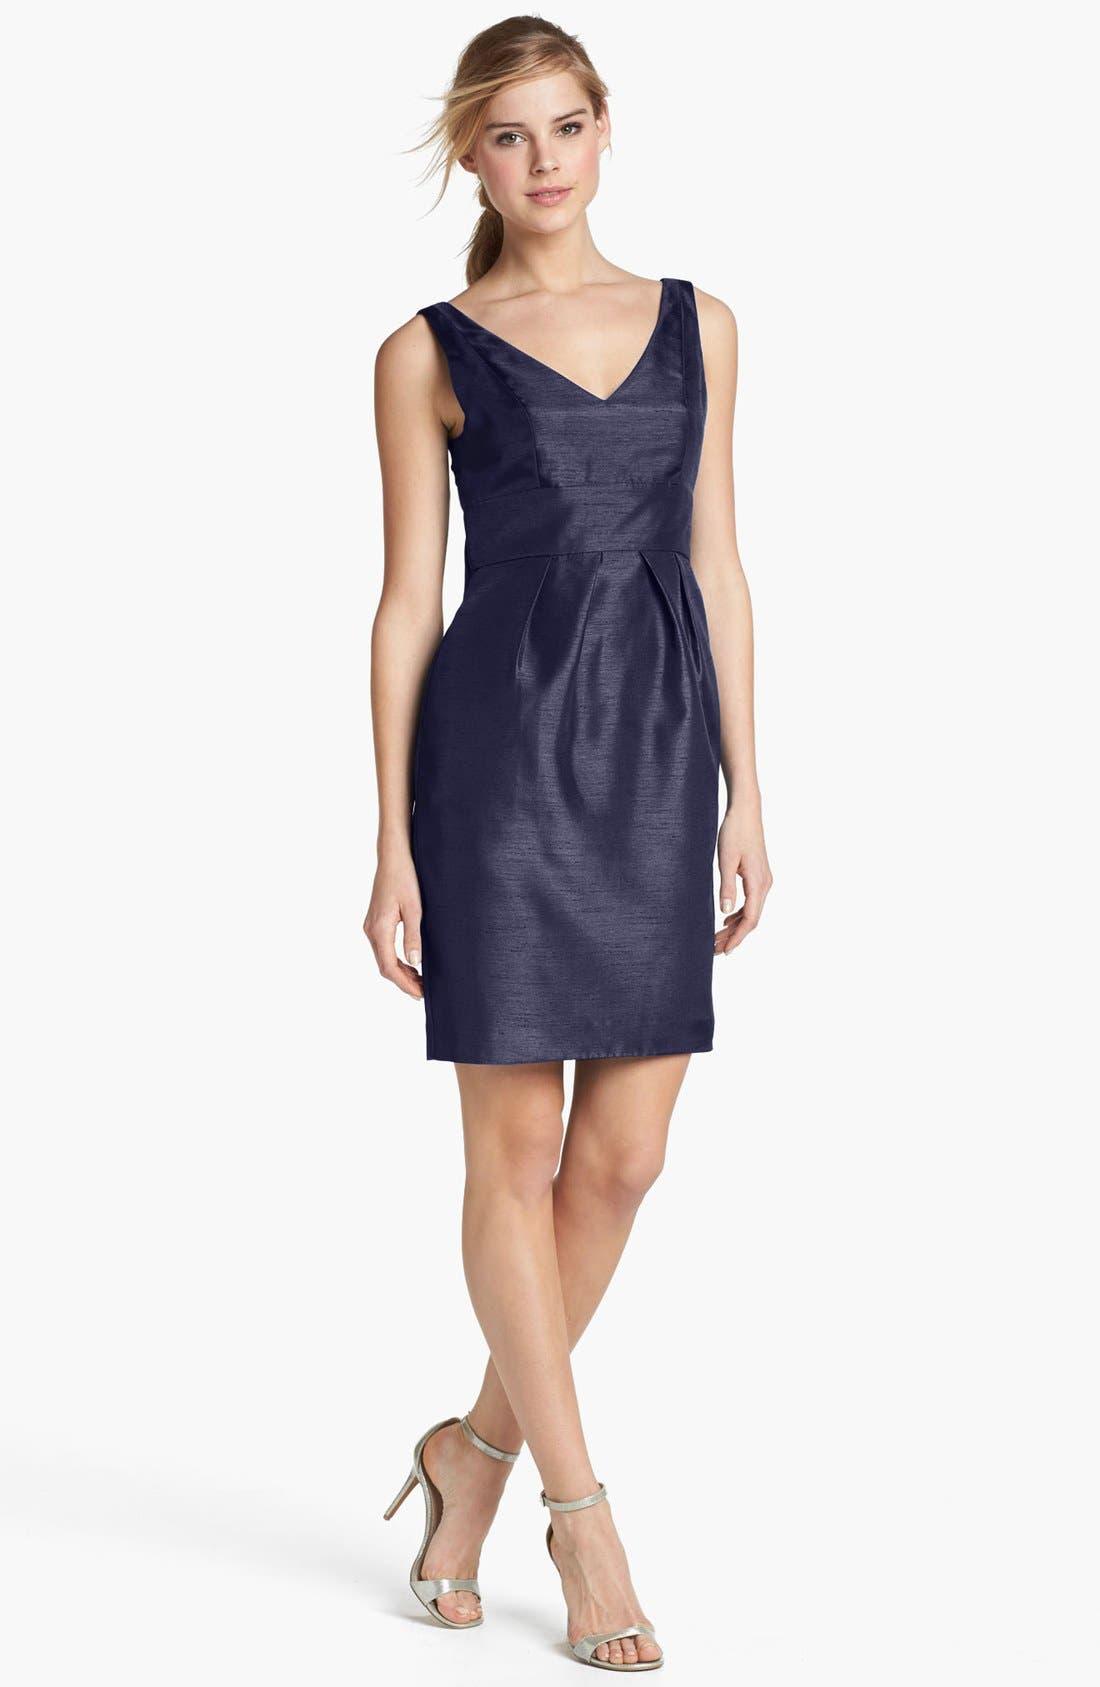 Alternate Image 1 Selected - Jenny Yoo 'Cadie' Bow Detail Shantung Sheath Dress